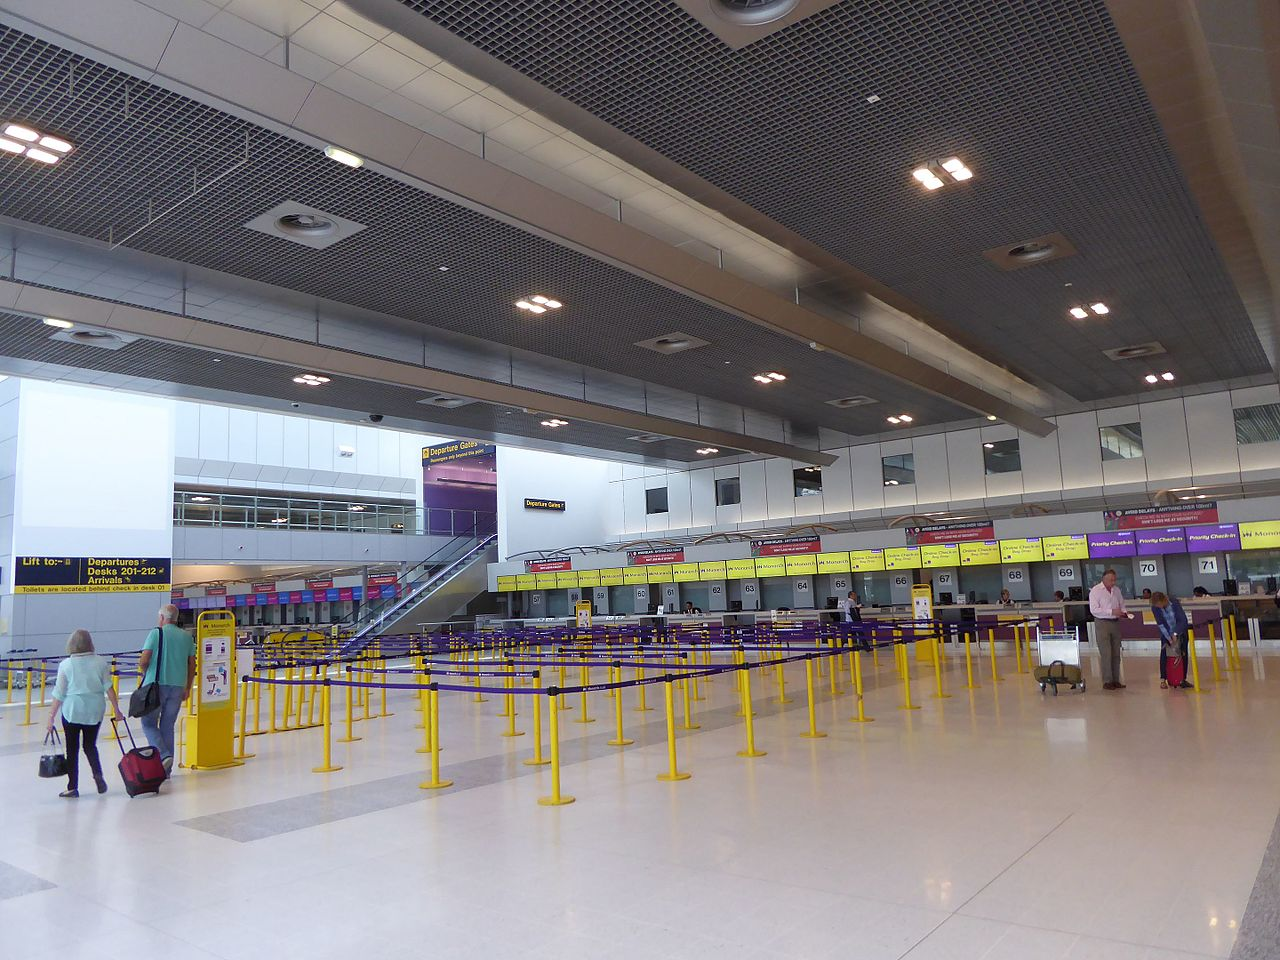 Uk-airport-9thNov